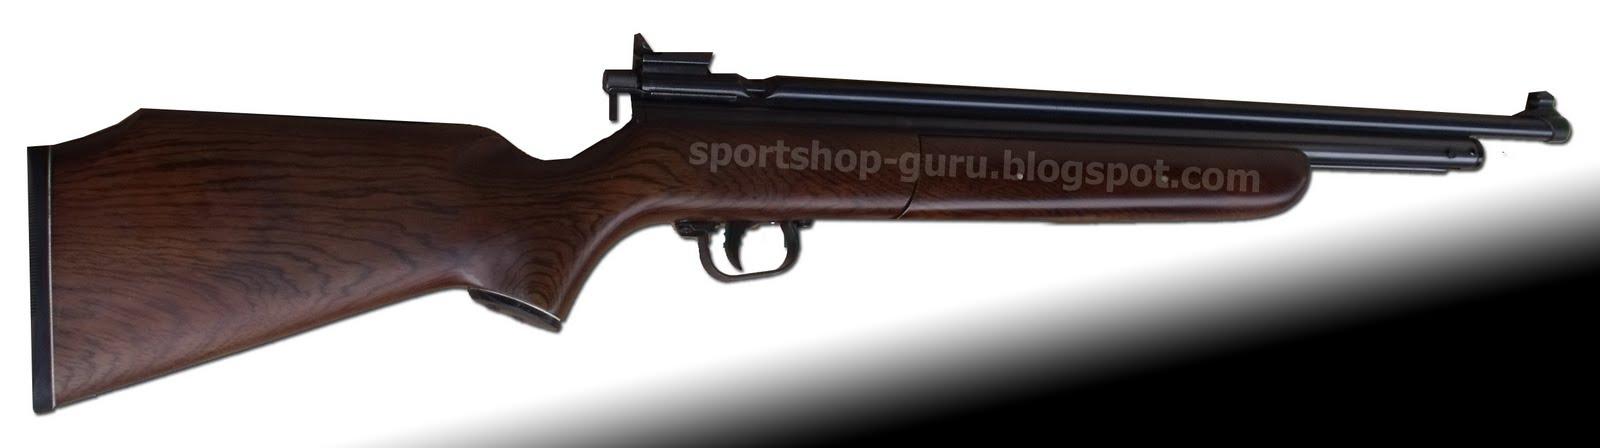 Senapan Angin Sharp Ace Hunter Sharp Ace Hunter Air Rifle